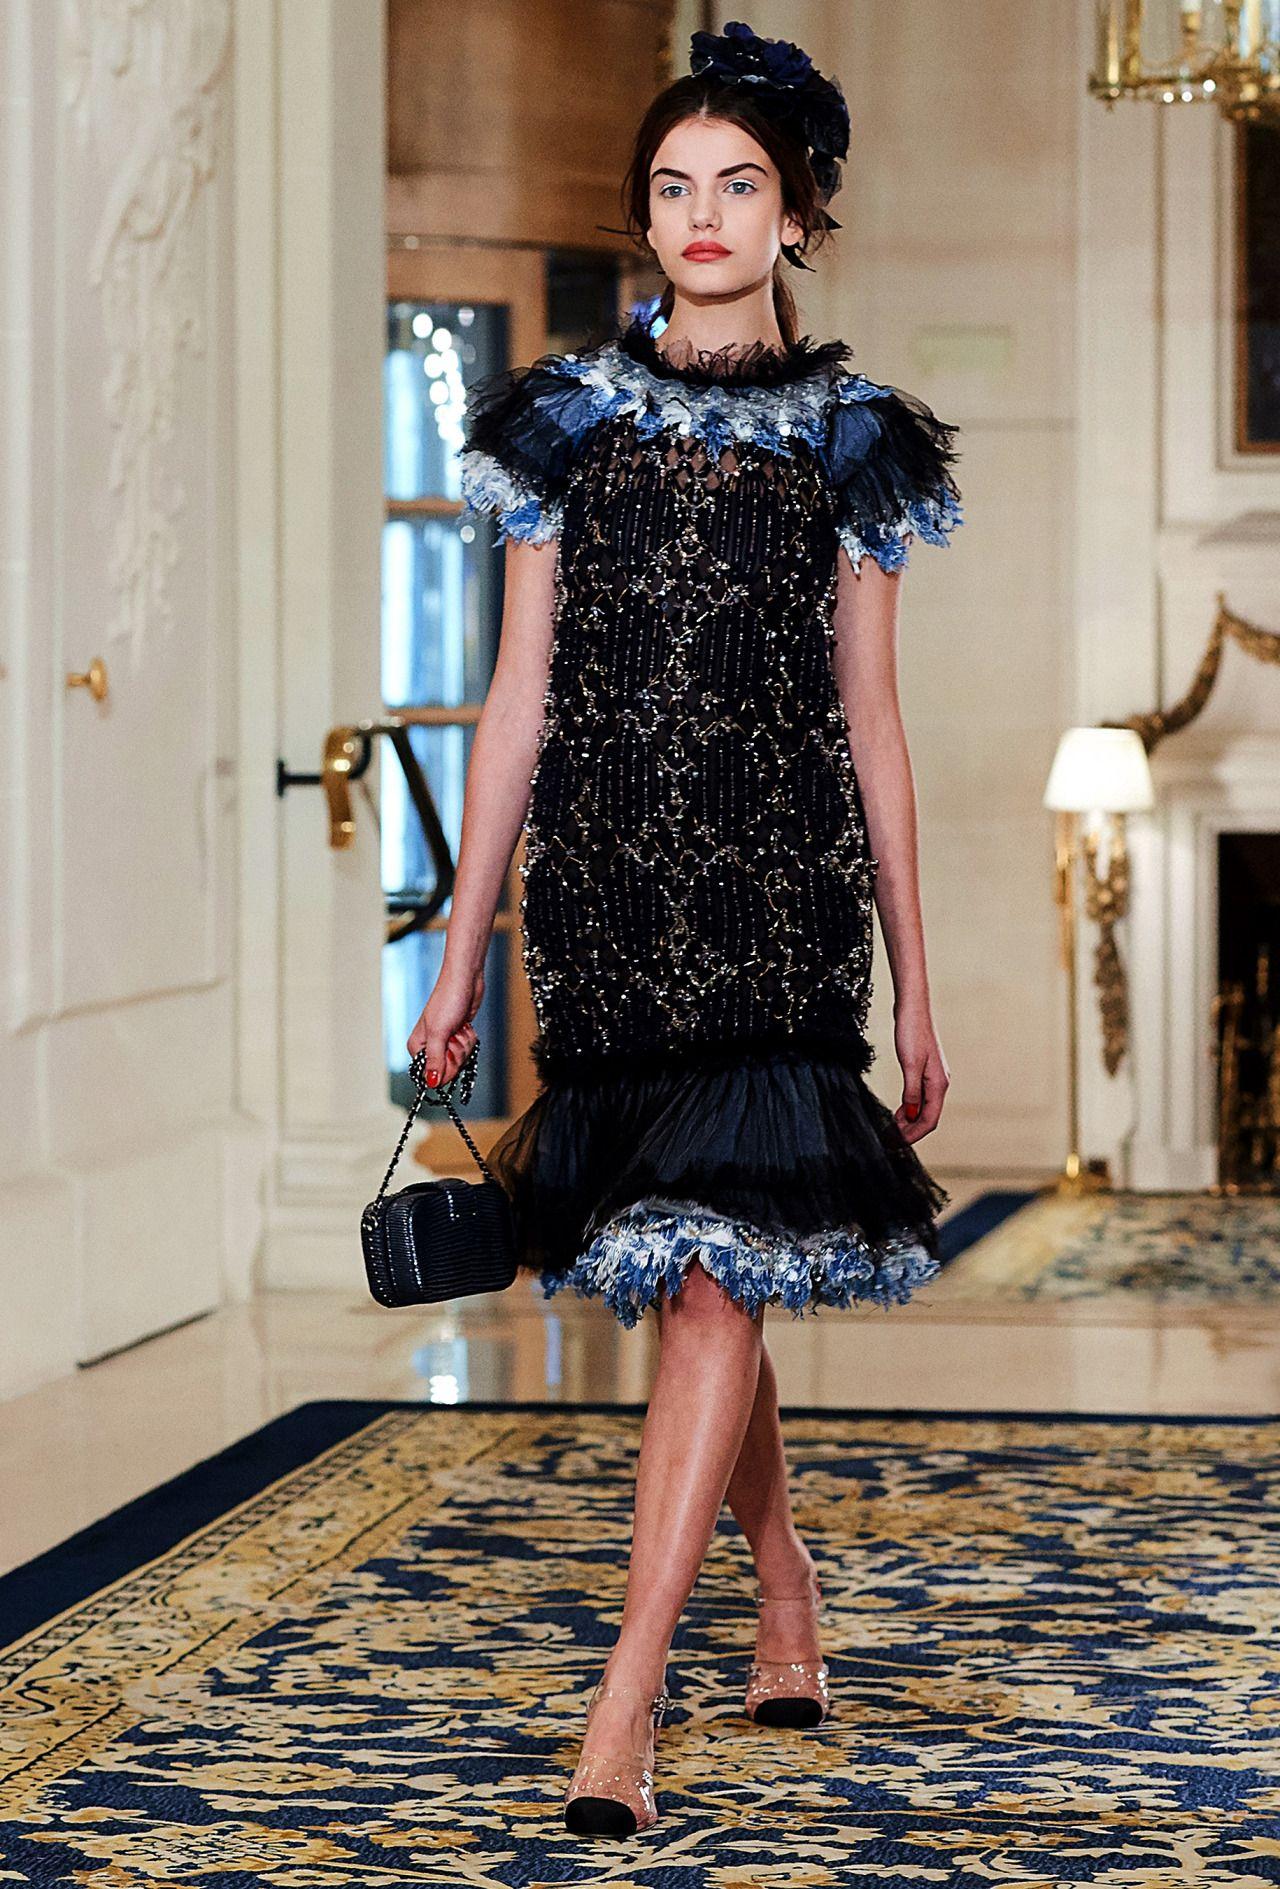 Kleider chanel stil